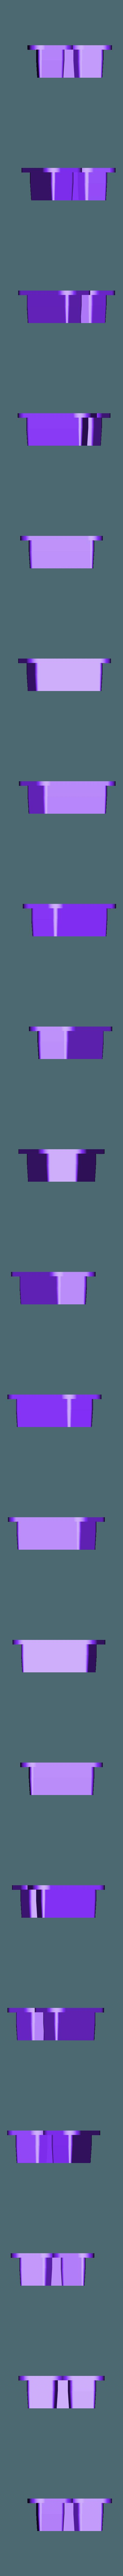 BLEU petit A.STL Download STL file Patrol Punch (Paw Patrol) • 3D print object, Chris-tropherIlParait